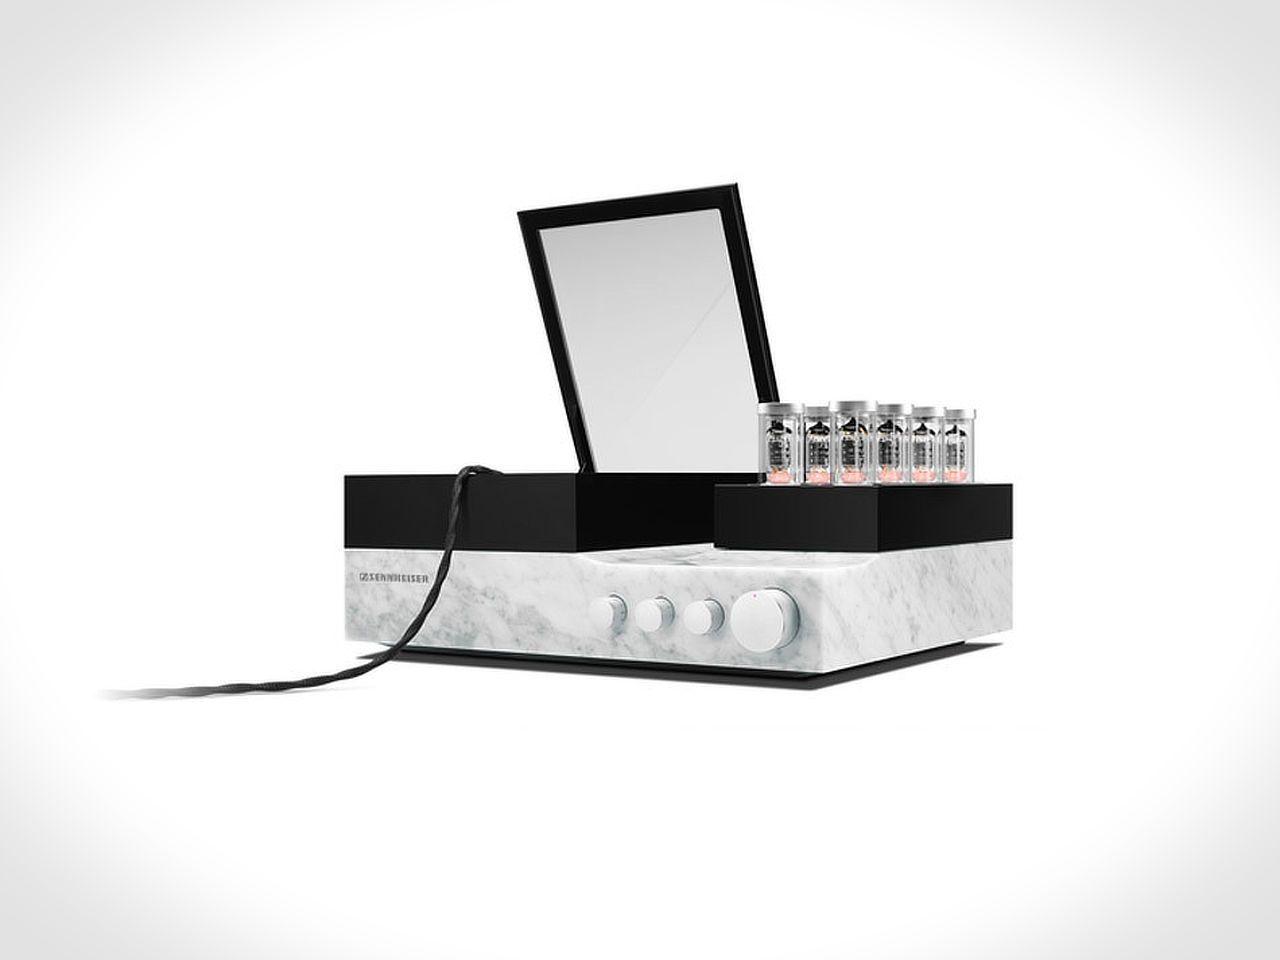 sennheiser-se-1-headphones-002